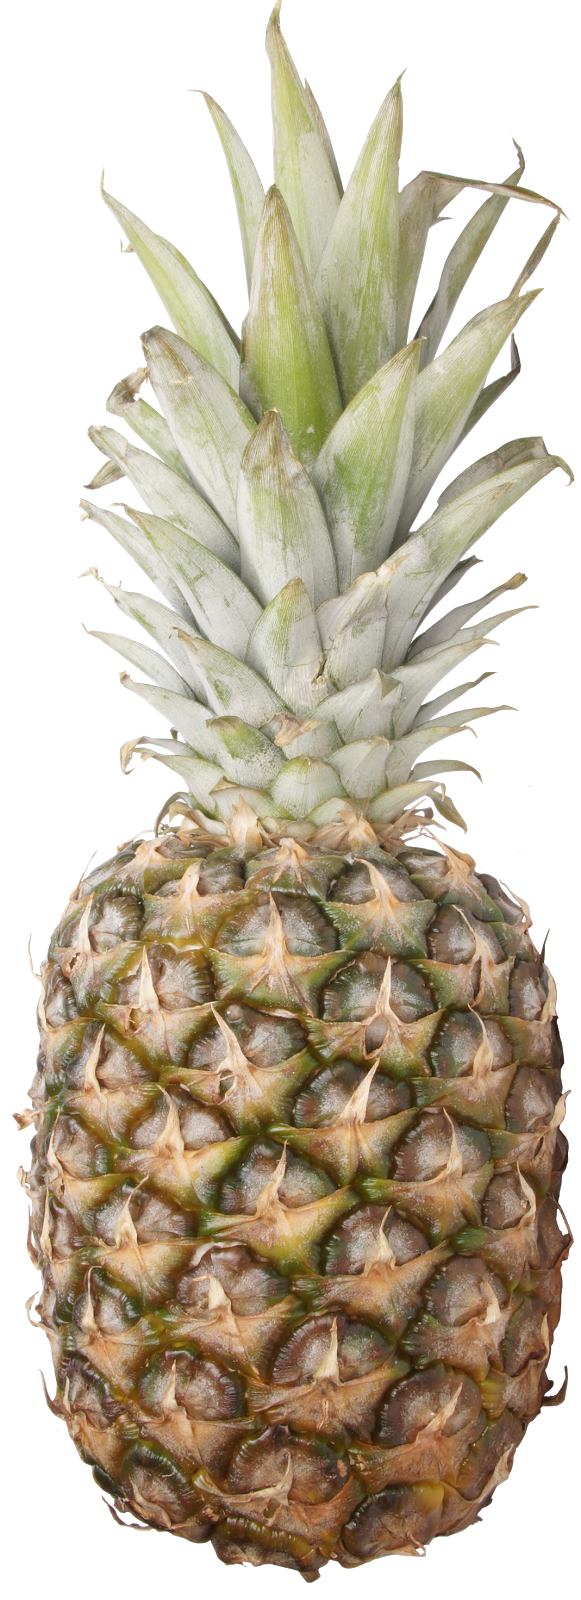 Imagens Limpas: Frutas - abacaxi - piña - pineapple - ananas - PNG - Transparente